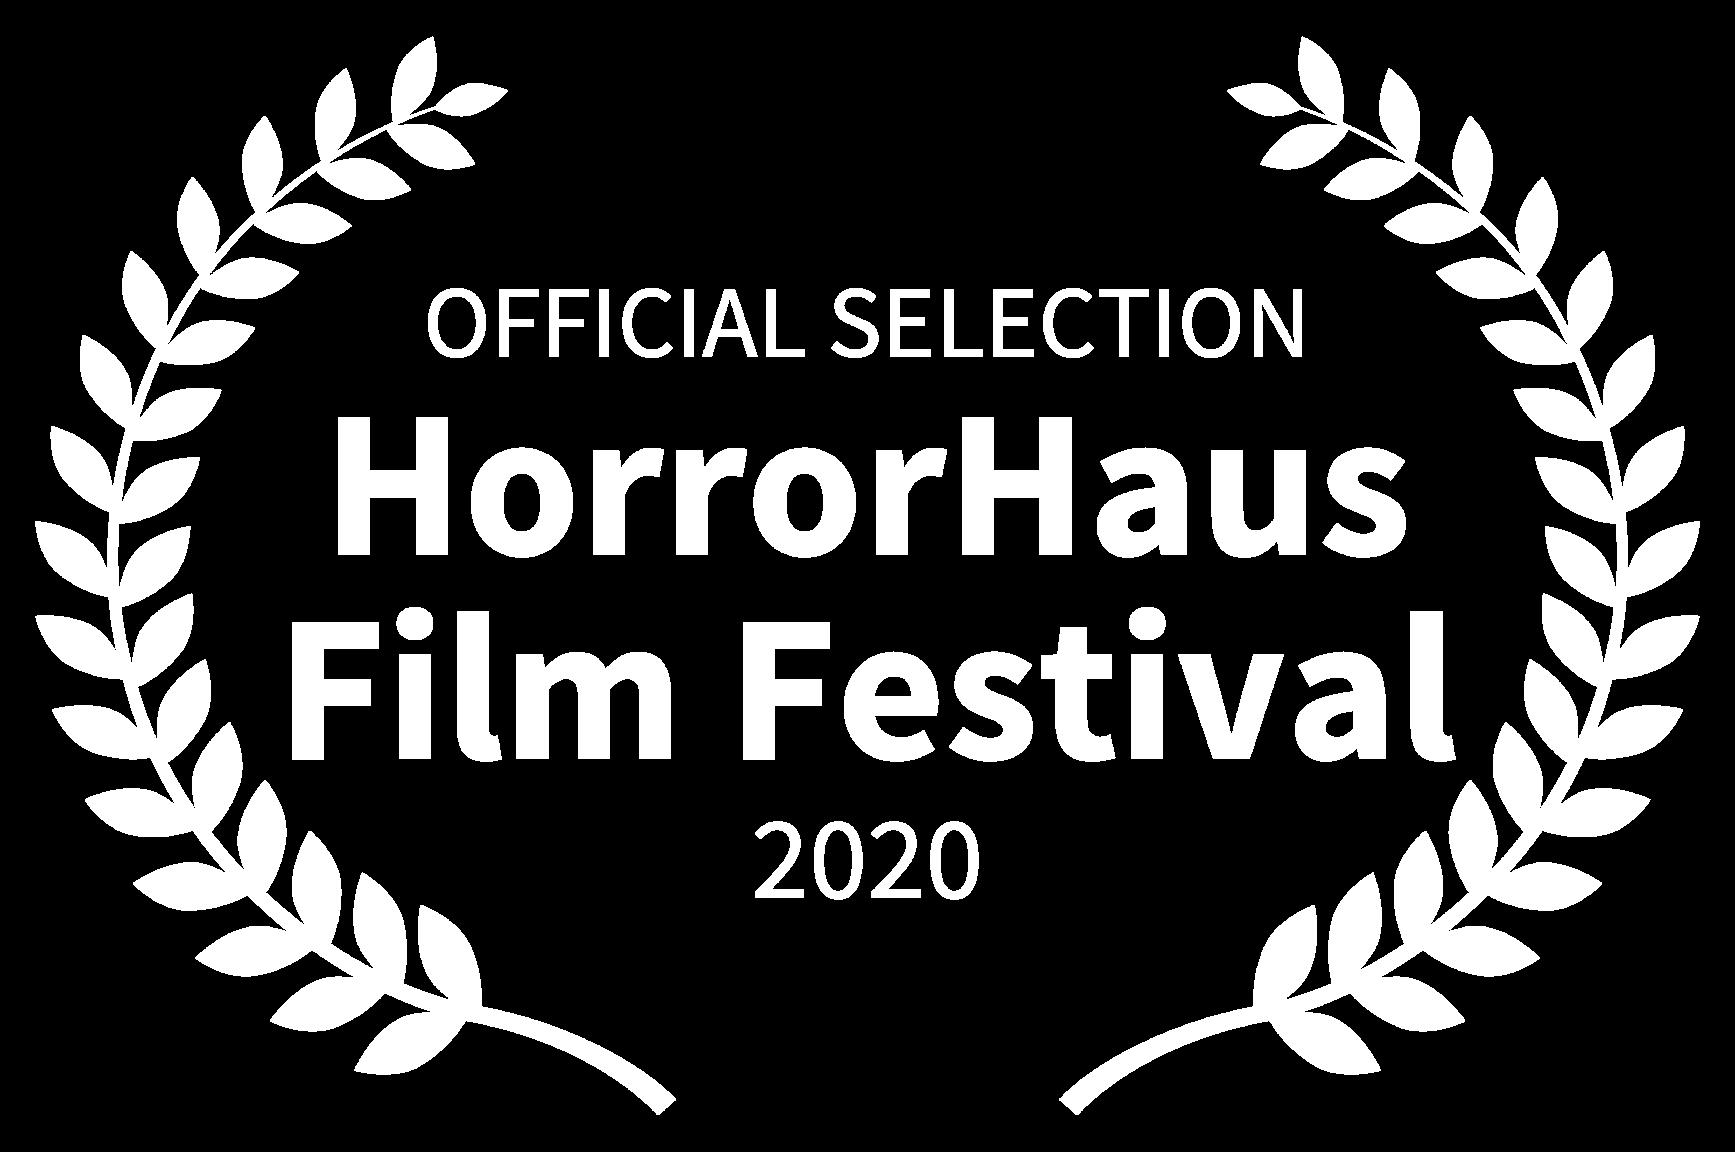 OFFICIAL SELECTION - HorrorHaus Film Festival - 2020